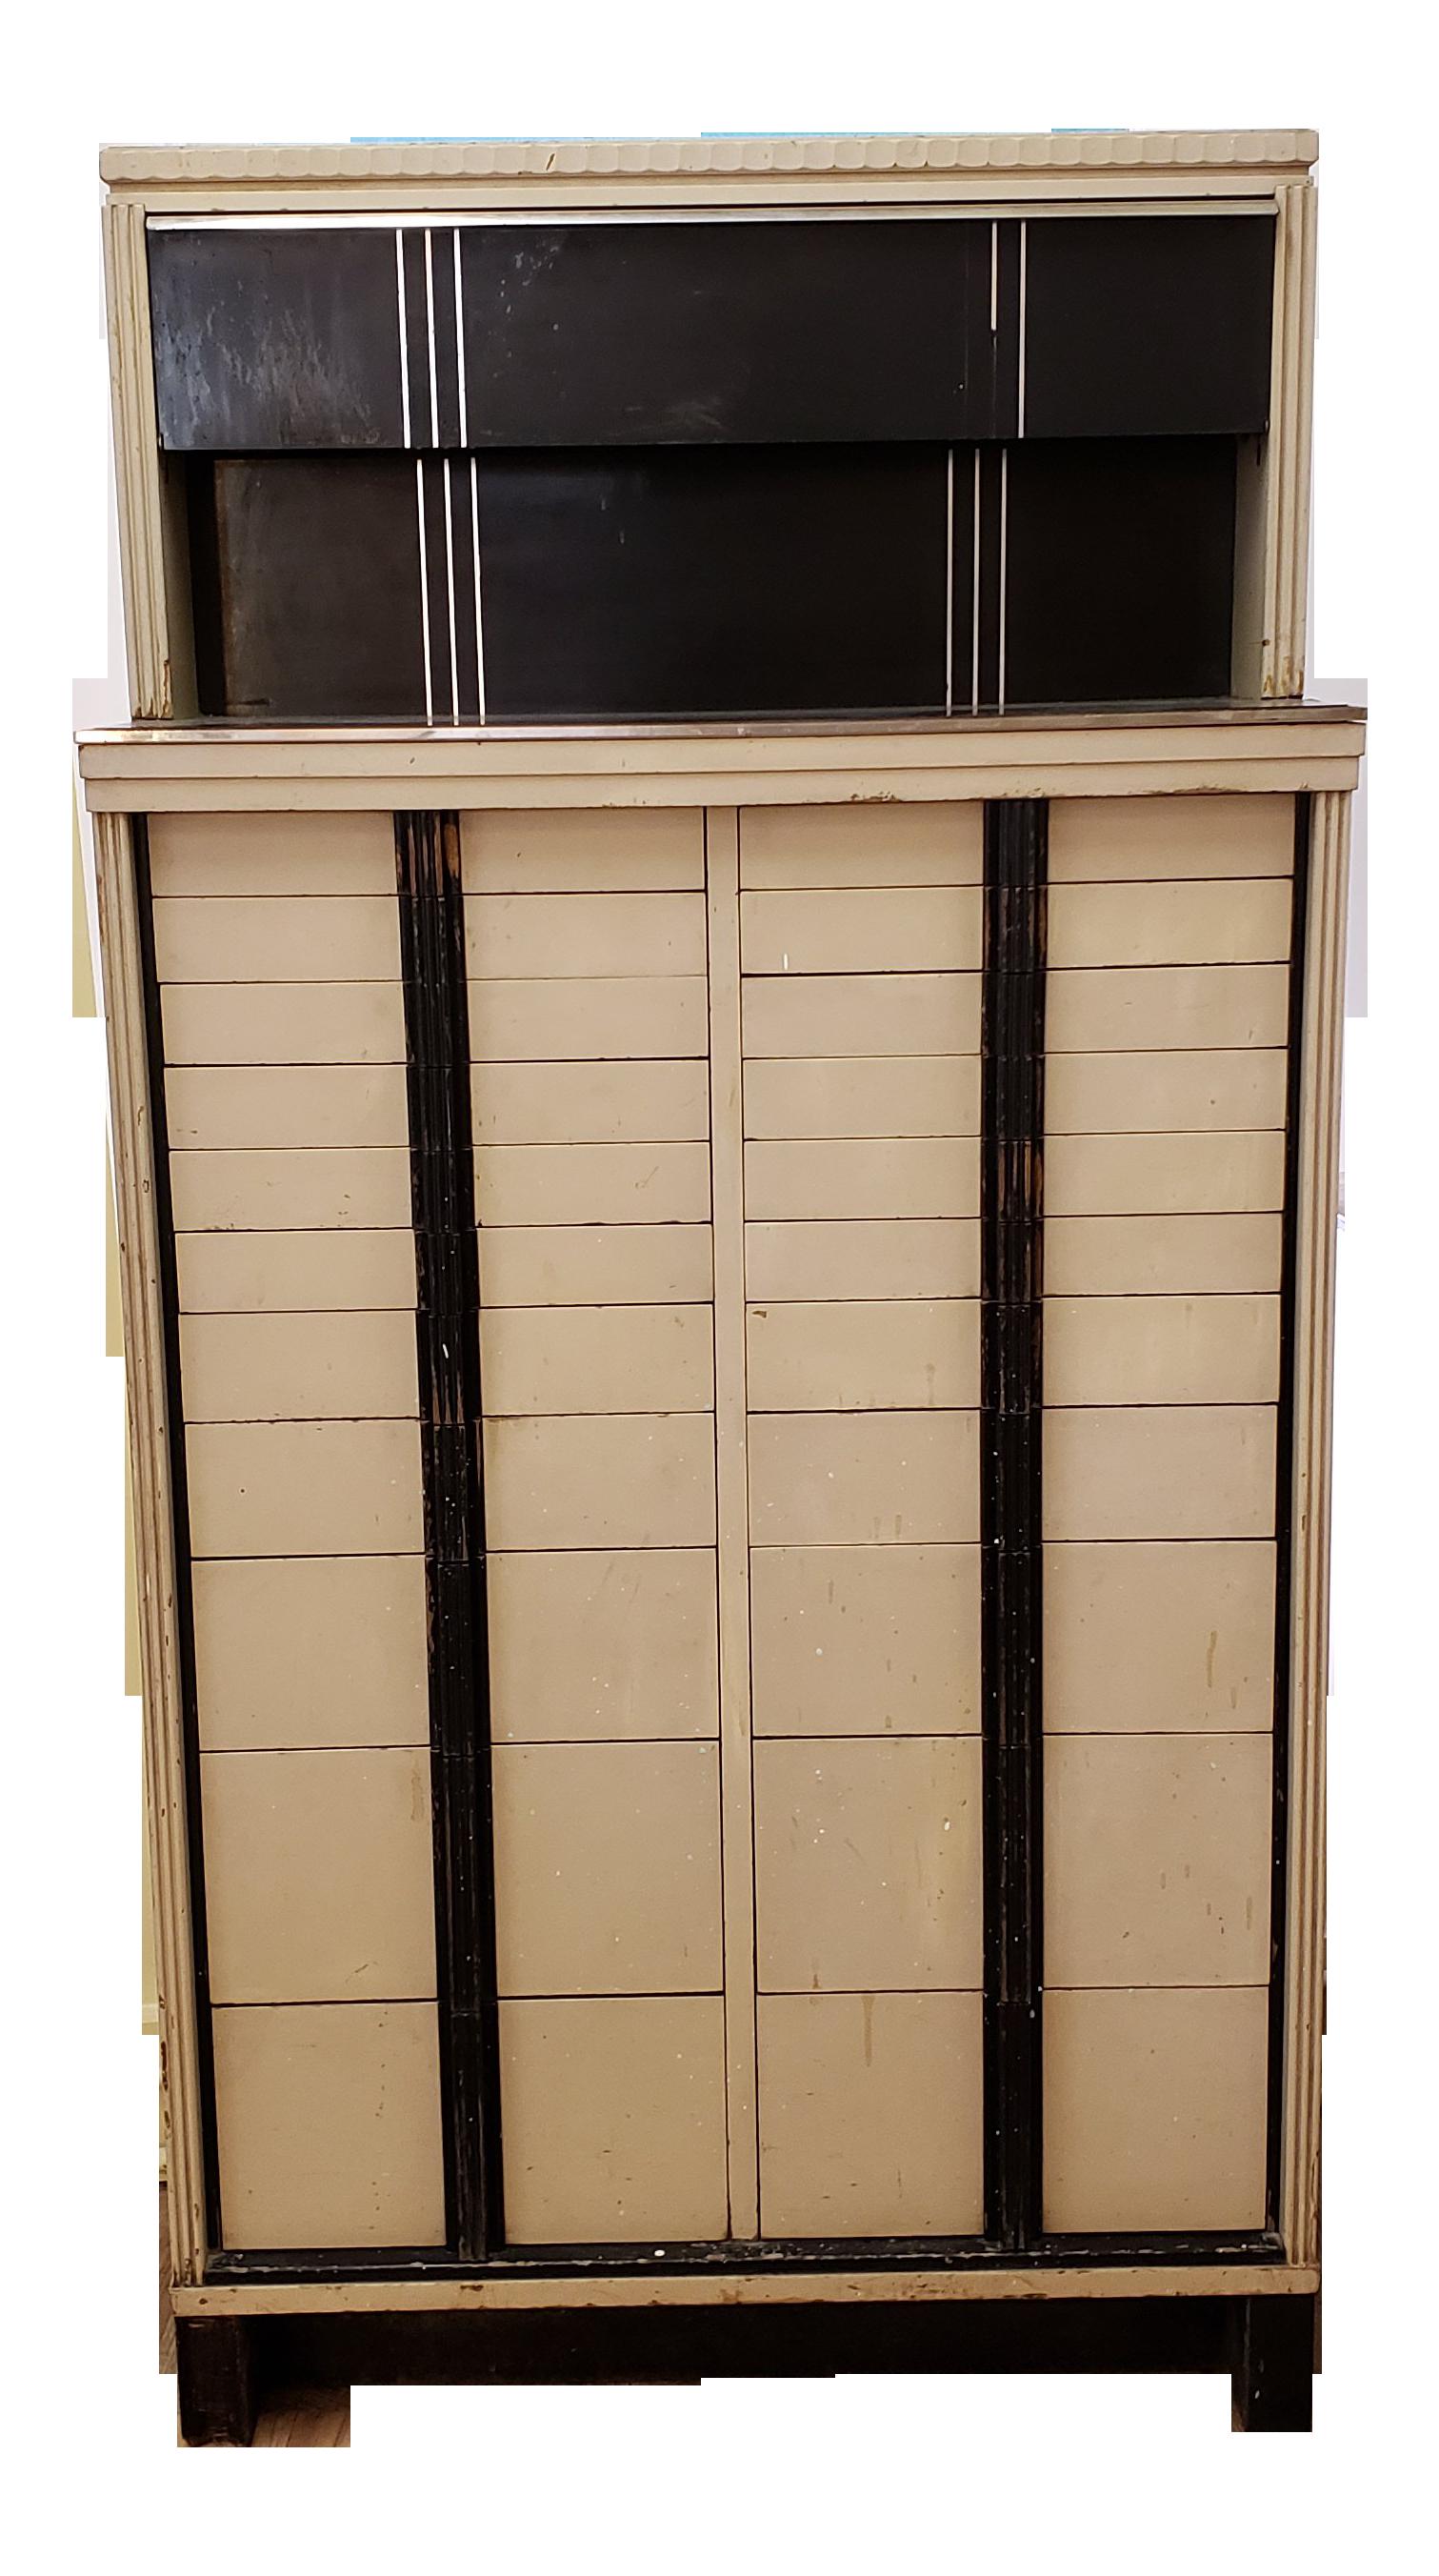 Vintage metal dresser hospital furniture 5 Yhome Art Deco Enameled Metal And Wood Dental Cabinet Pinterest Vintage Used Filing And Storage Cabinets For Sale Chairish